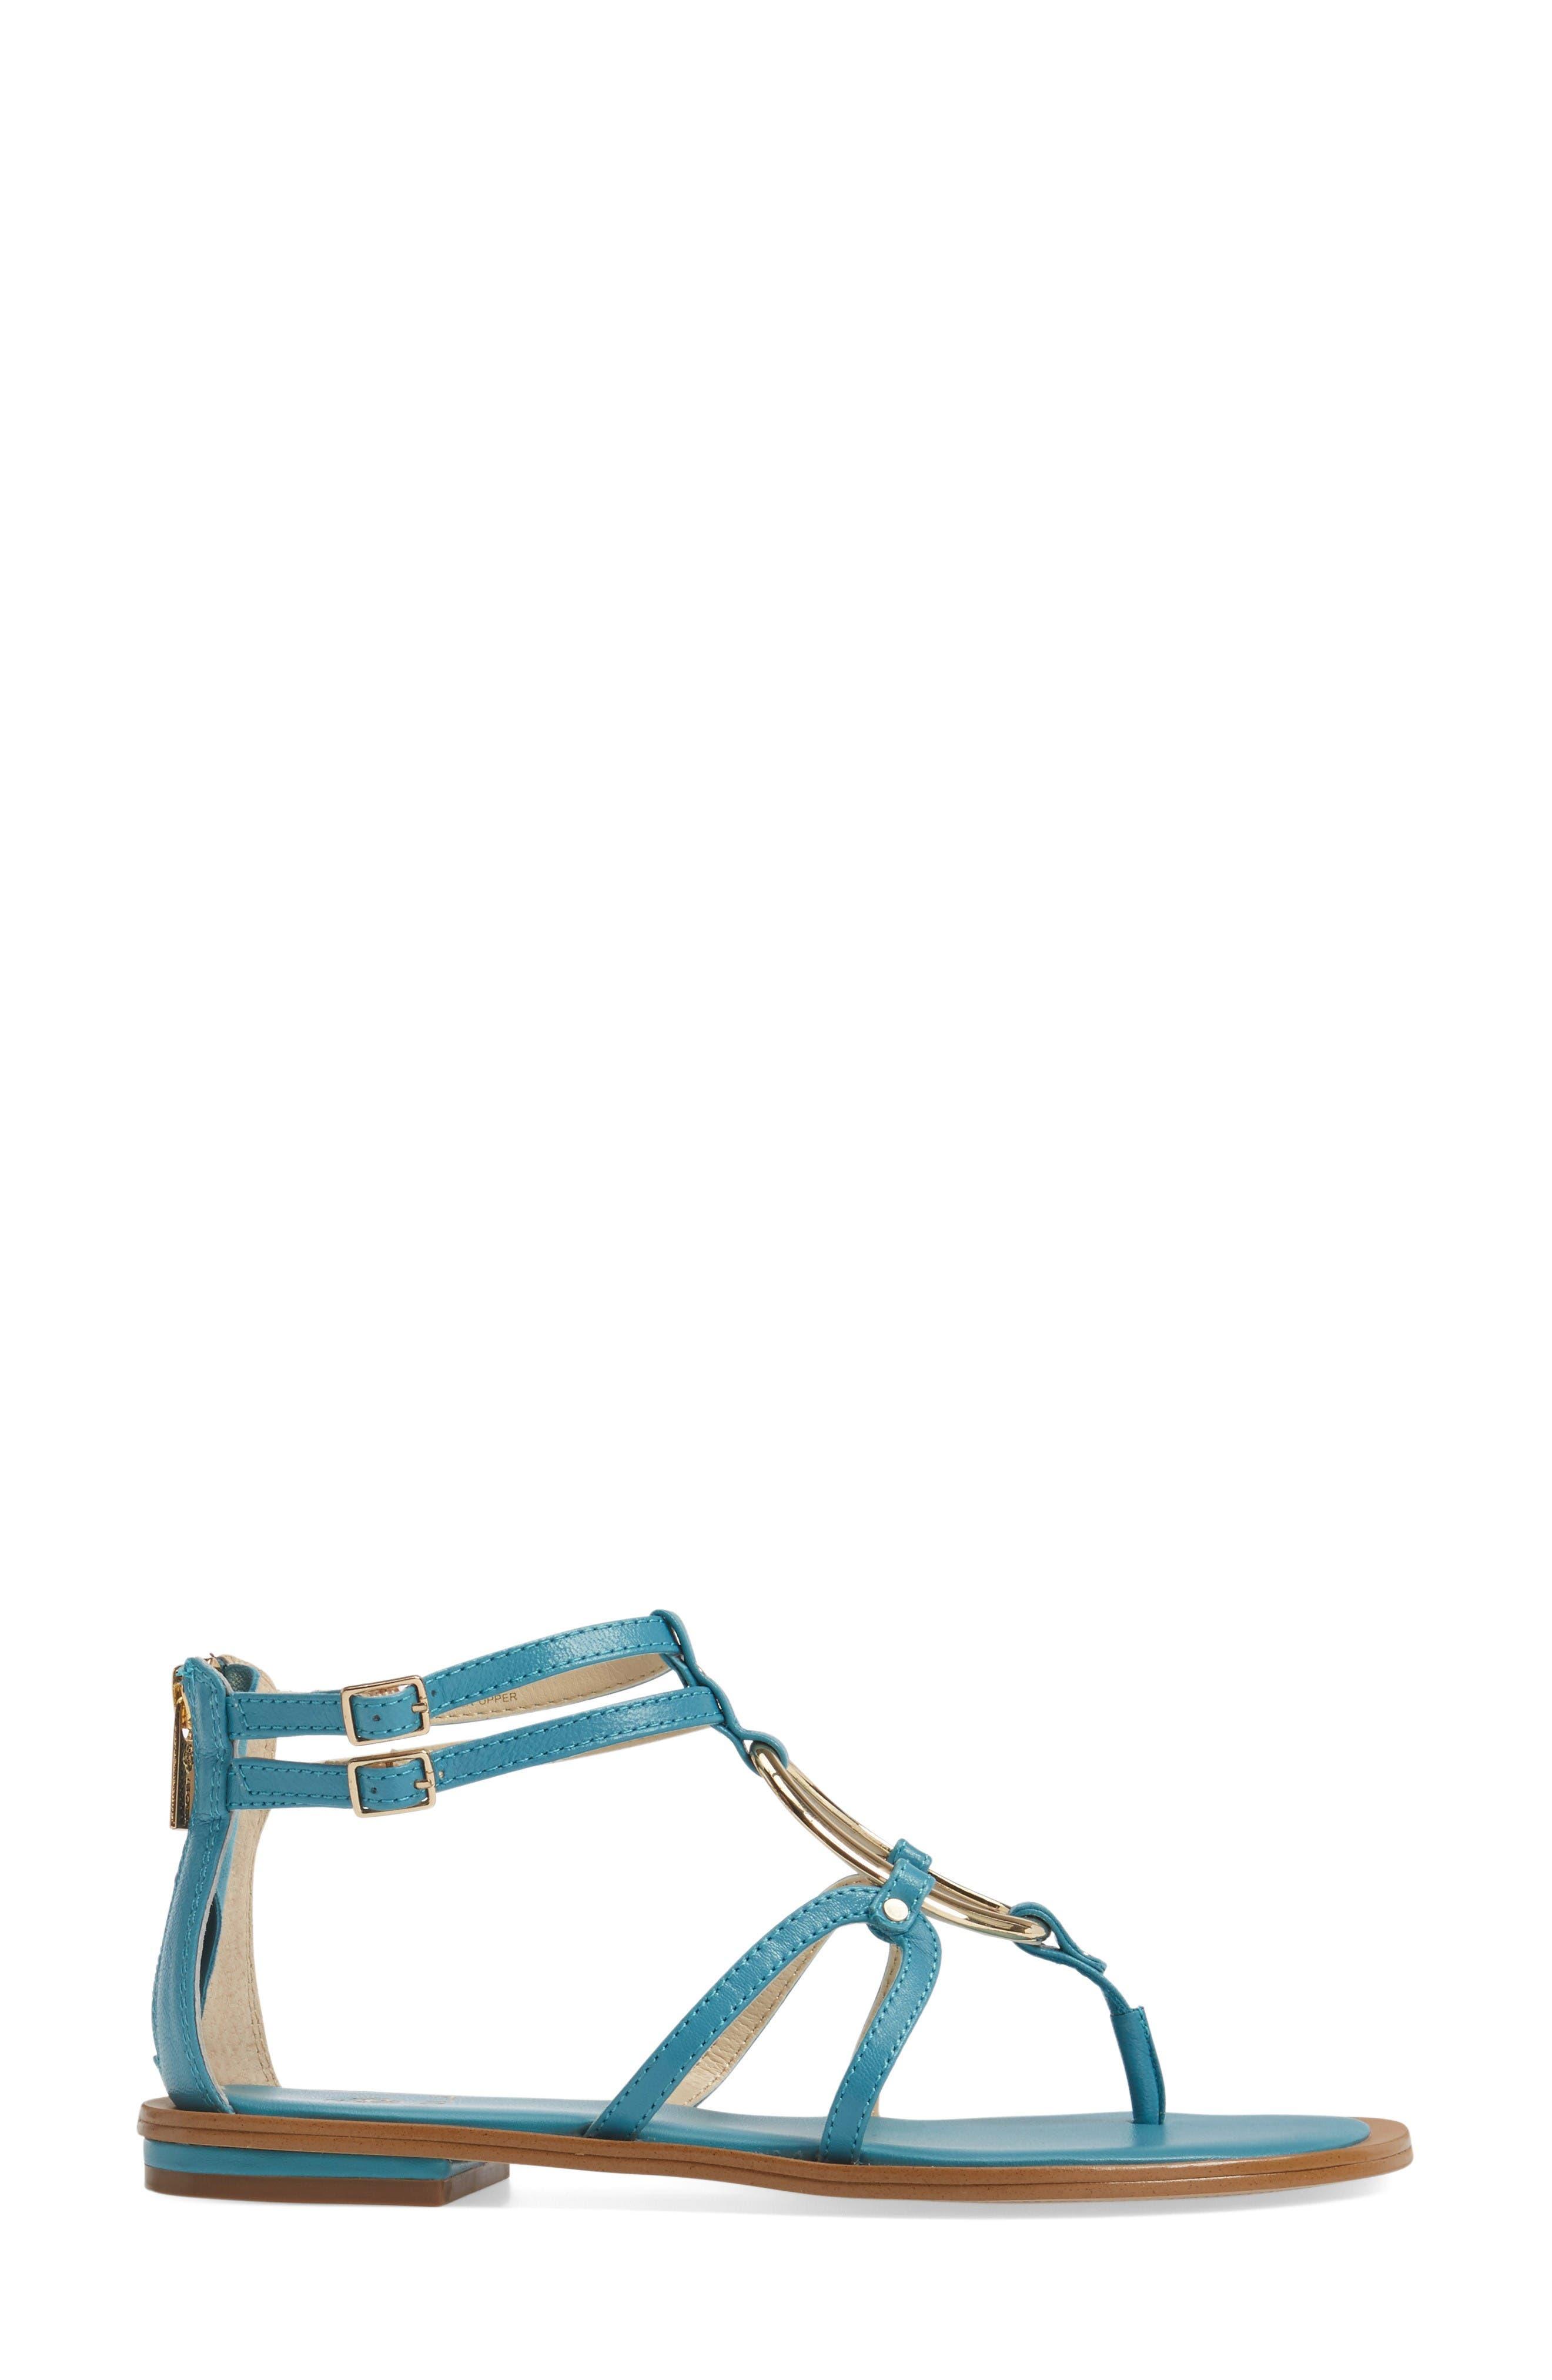 Melaney Sandal,                             Alternate thumbnail 3, color,                             Aqua Leather